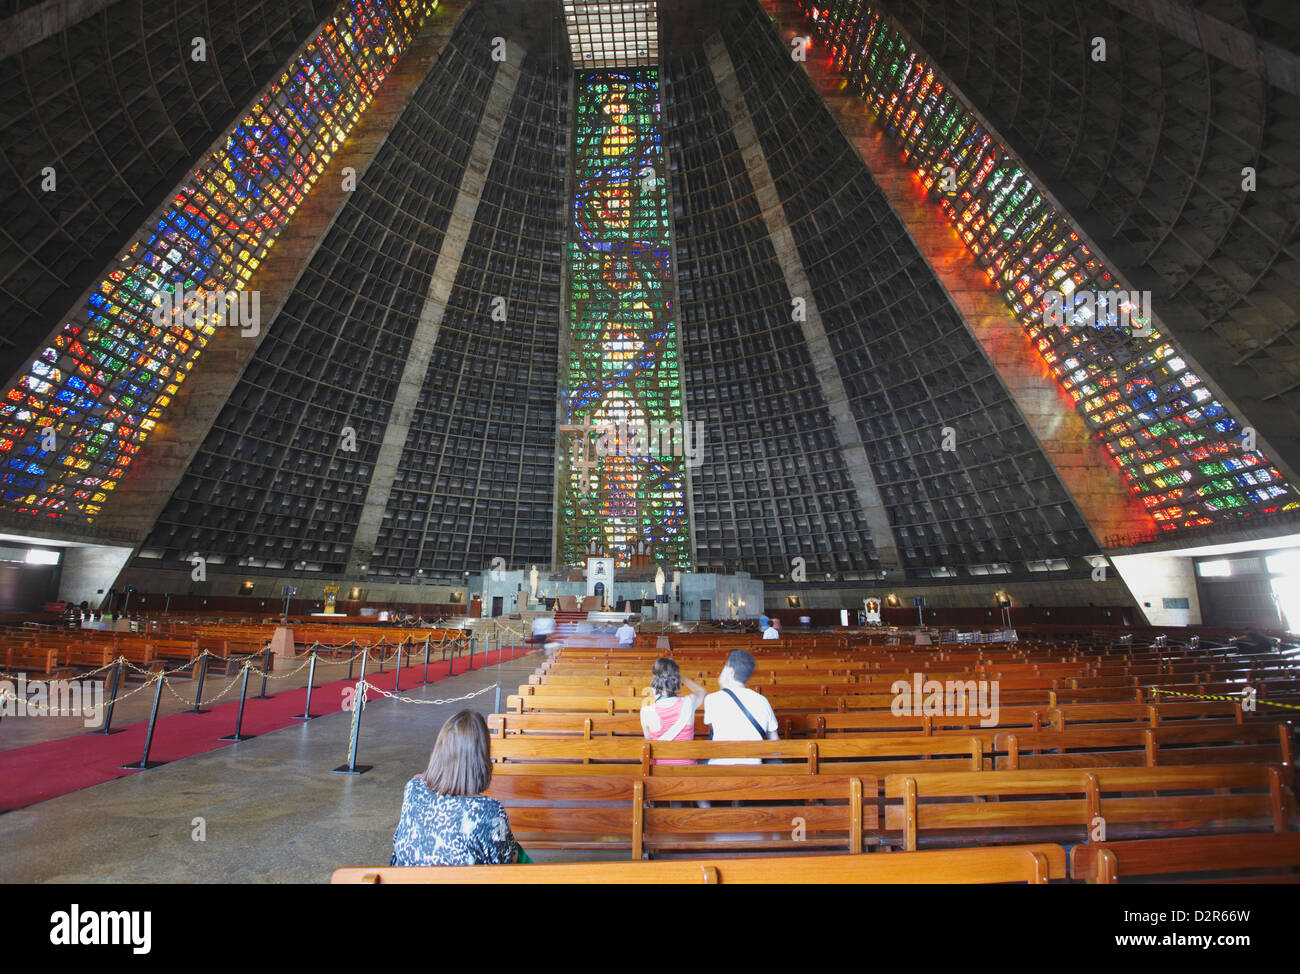 Innere des Metropolitan Kathedrale St. Sebastian, Centro, Rio De Janeiro, Brasilien, Südamerika Stockbild